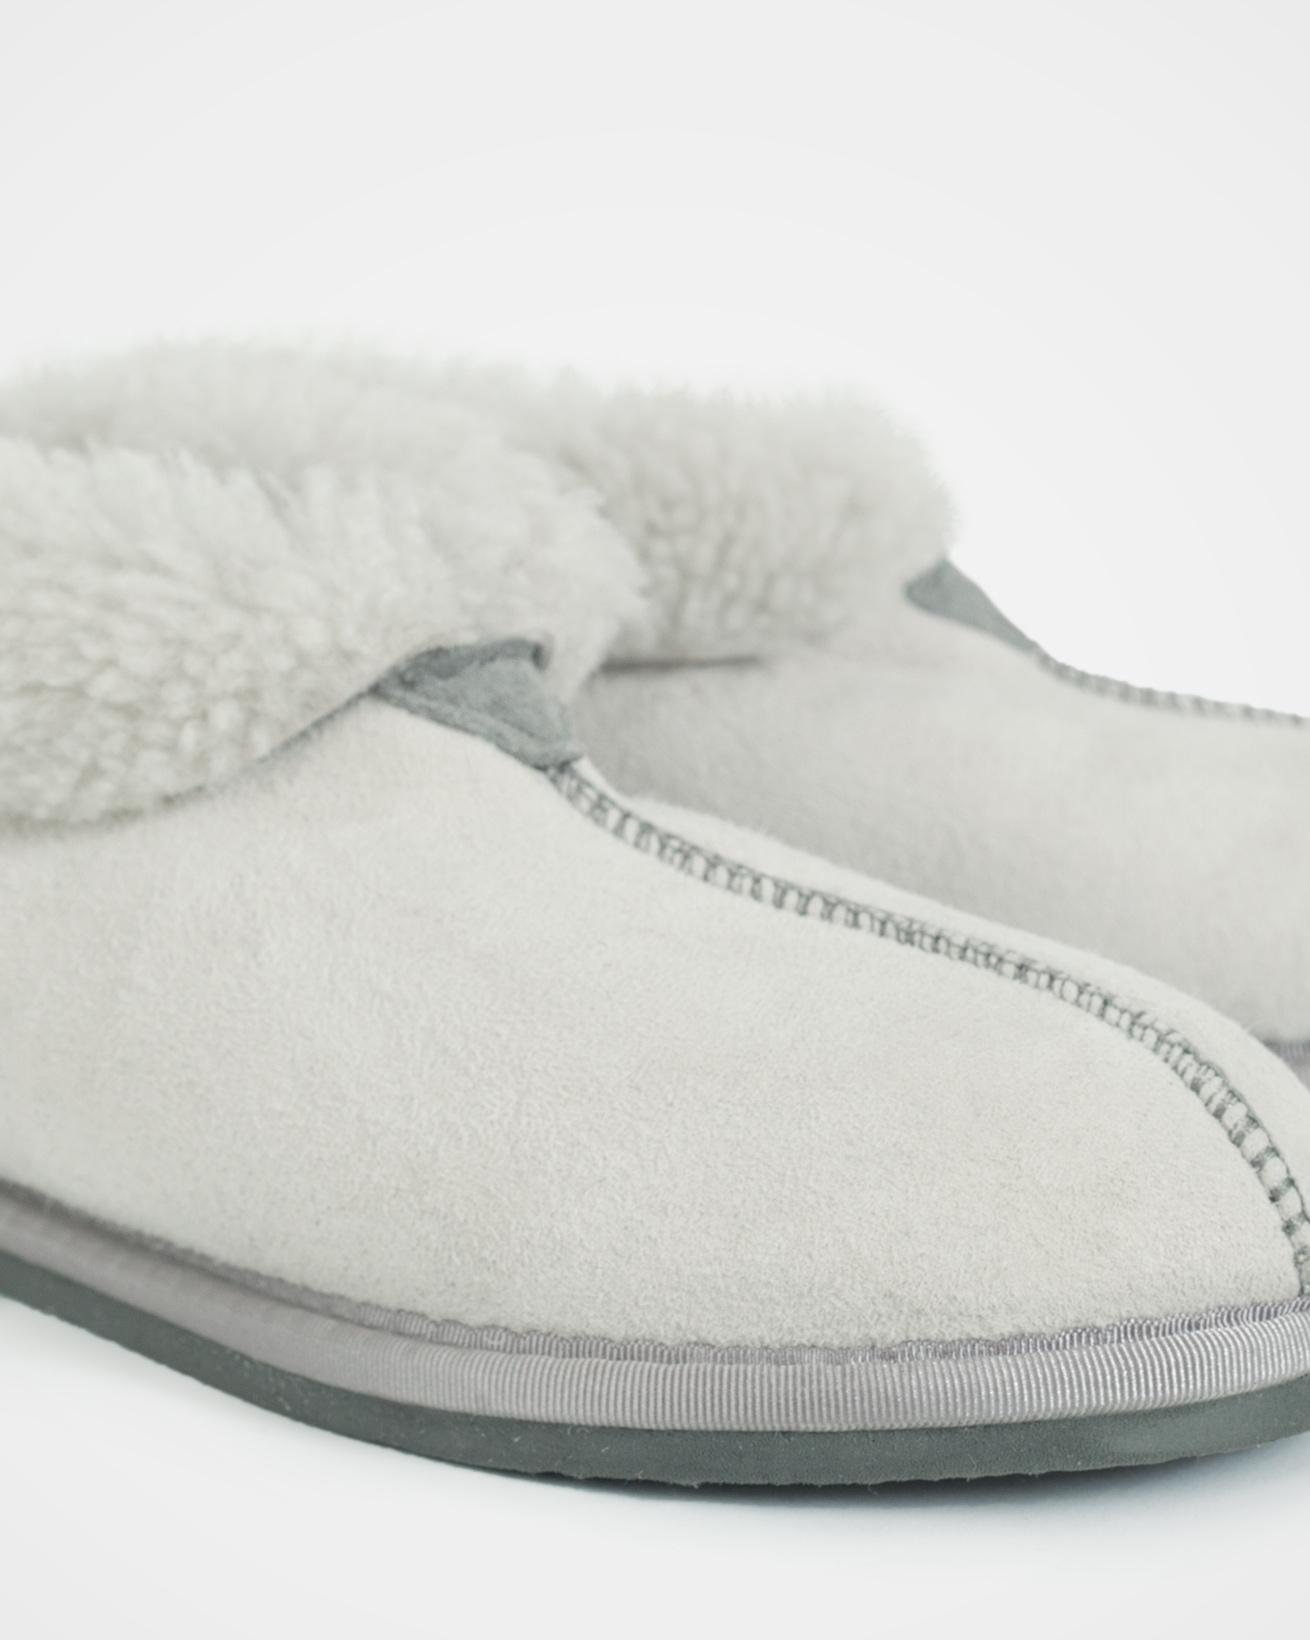 2100_ladies-sheepskin-bootee-slippers_winter-white_detail.jpg